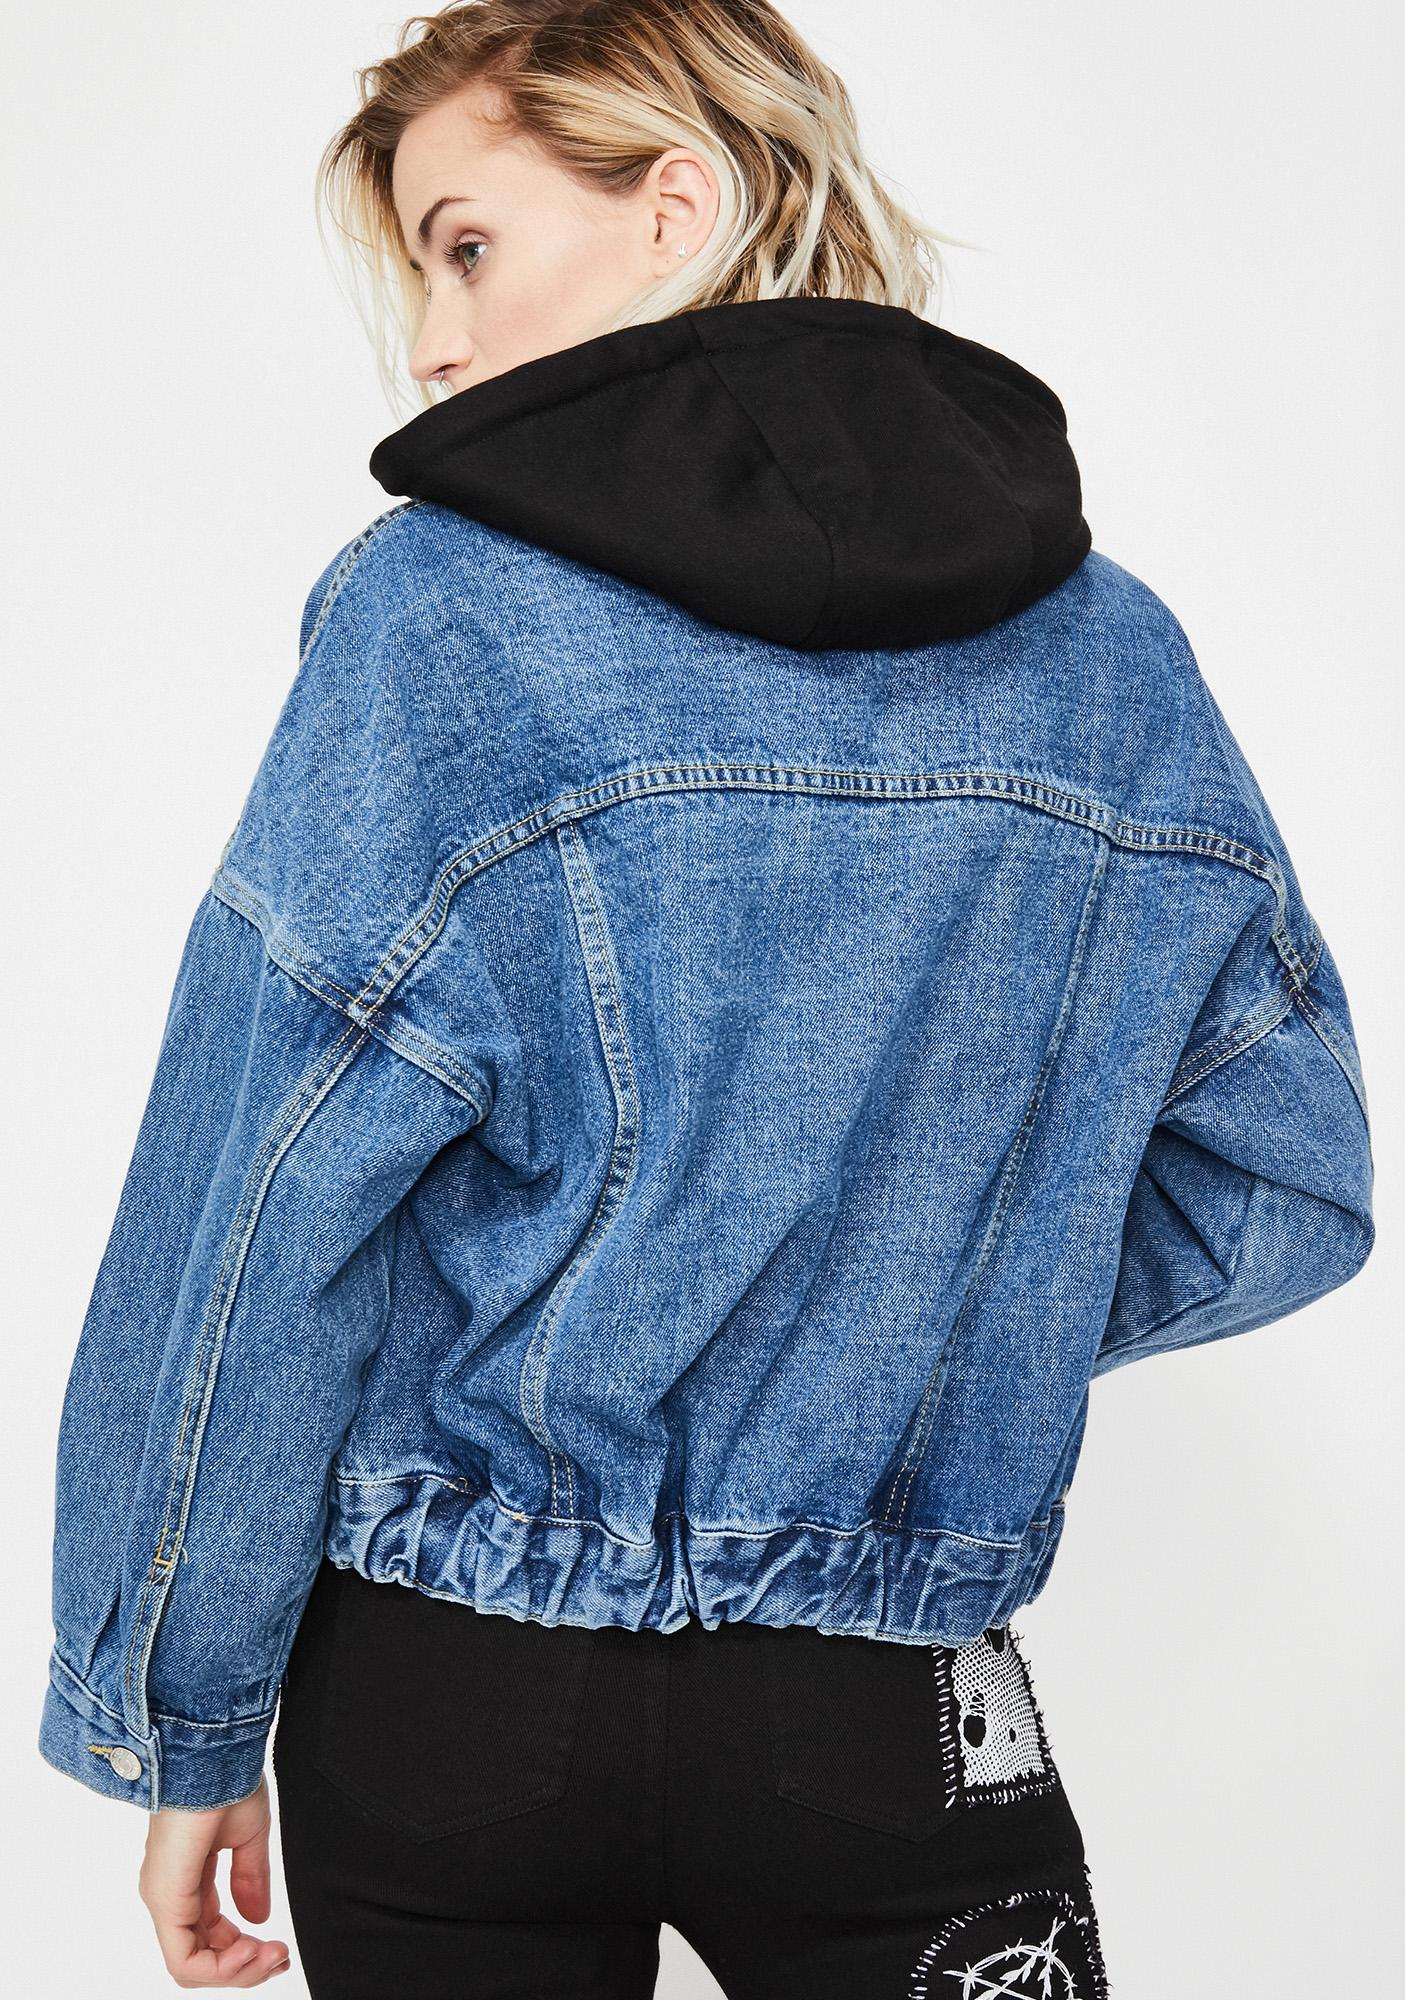 Bad Habit Denim Jacket